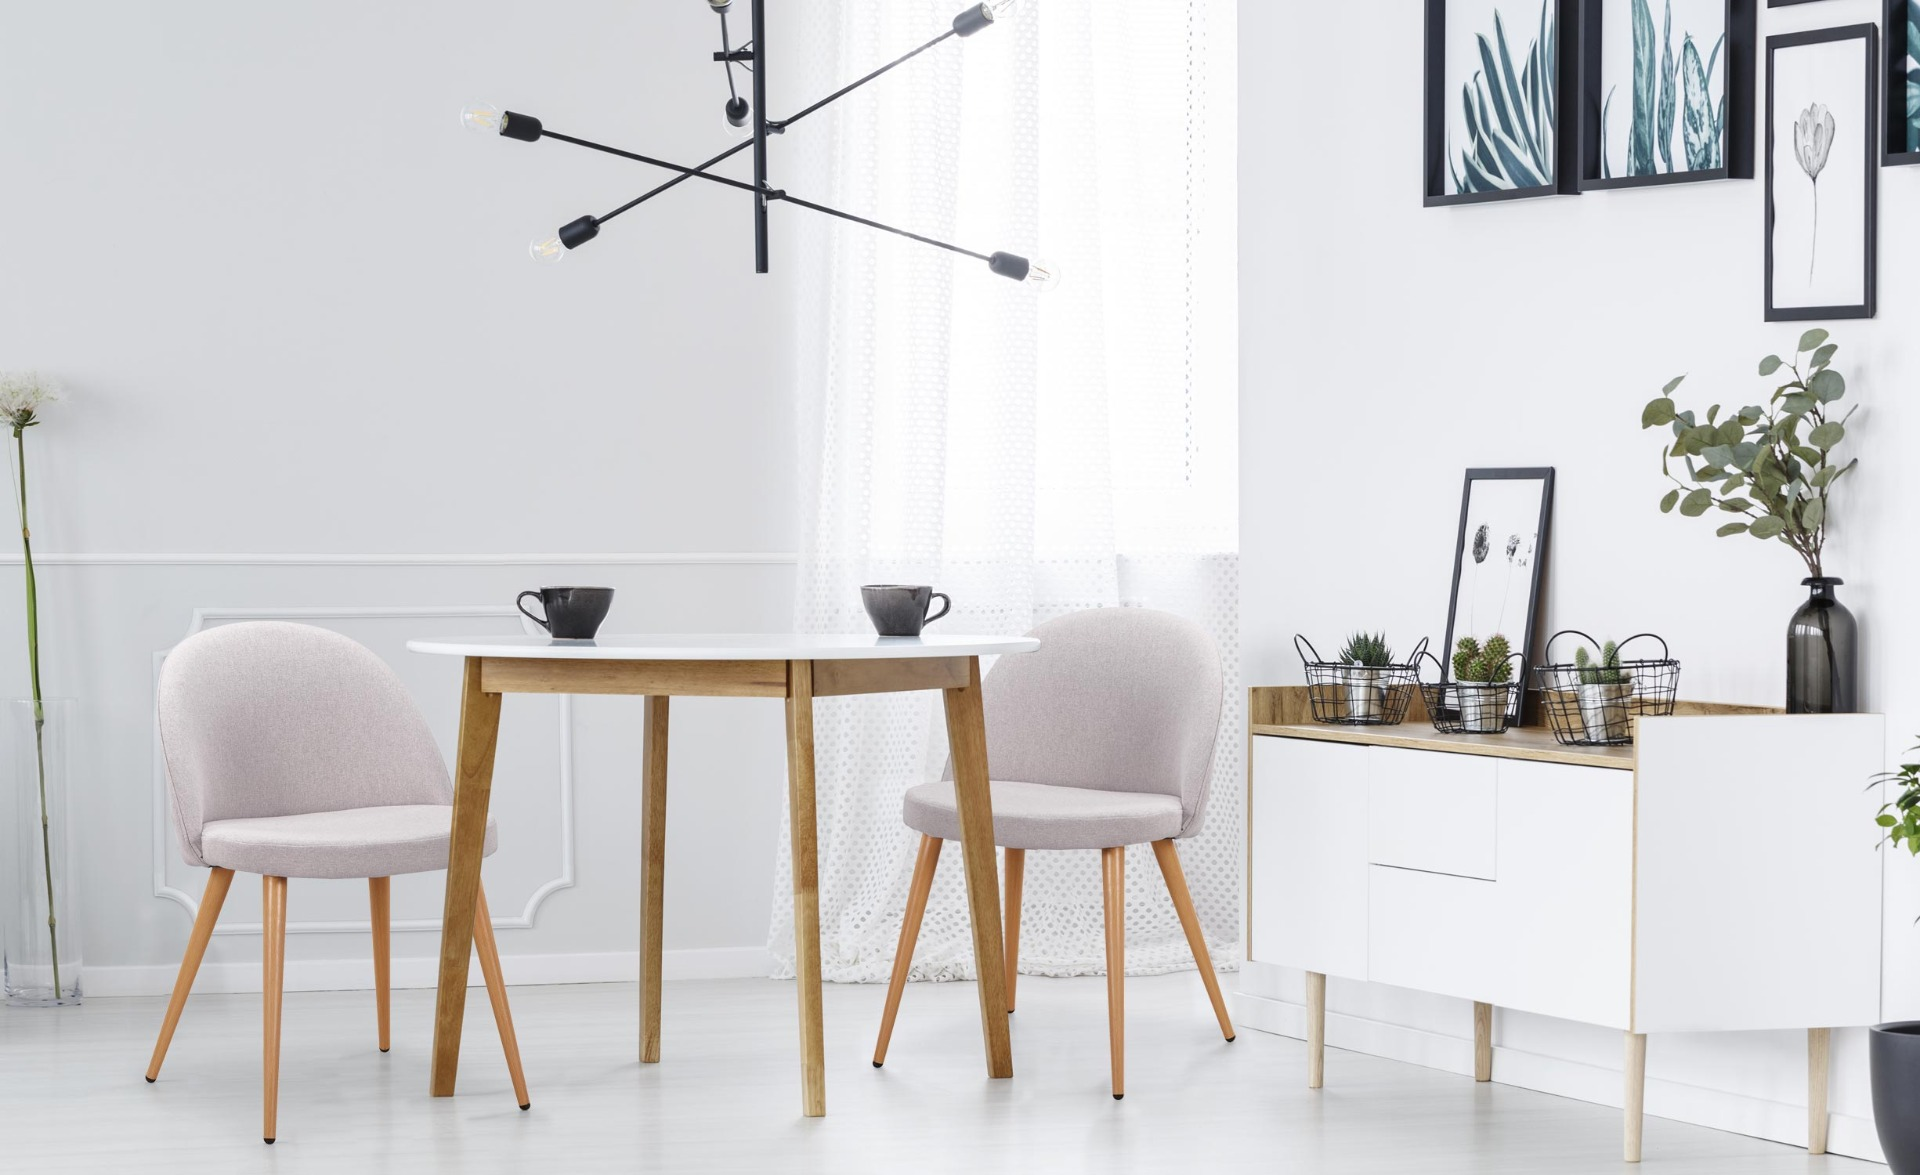 Set di 2 sedie scandinave Maury in tessuto  grigio chiaro